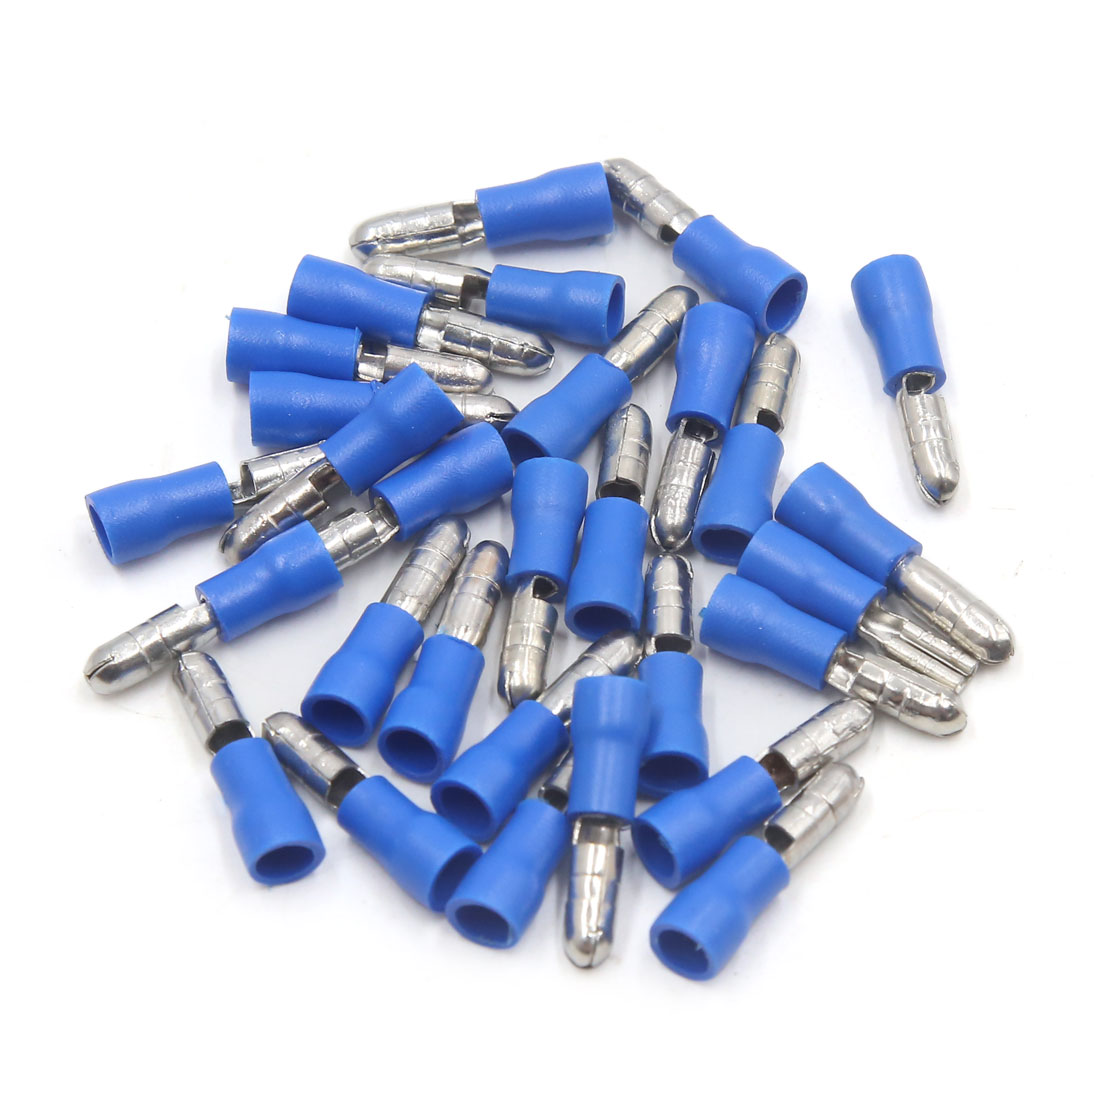 29pcs Car Auto Electric Cable Wire Insulated Crimp Terminals Blue Silver Tone